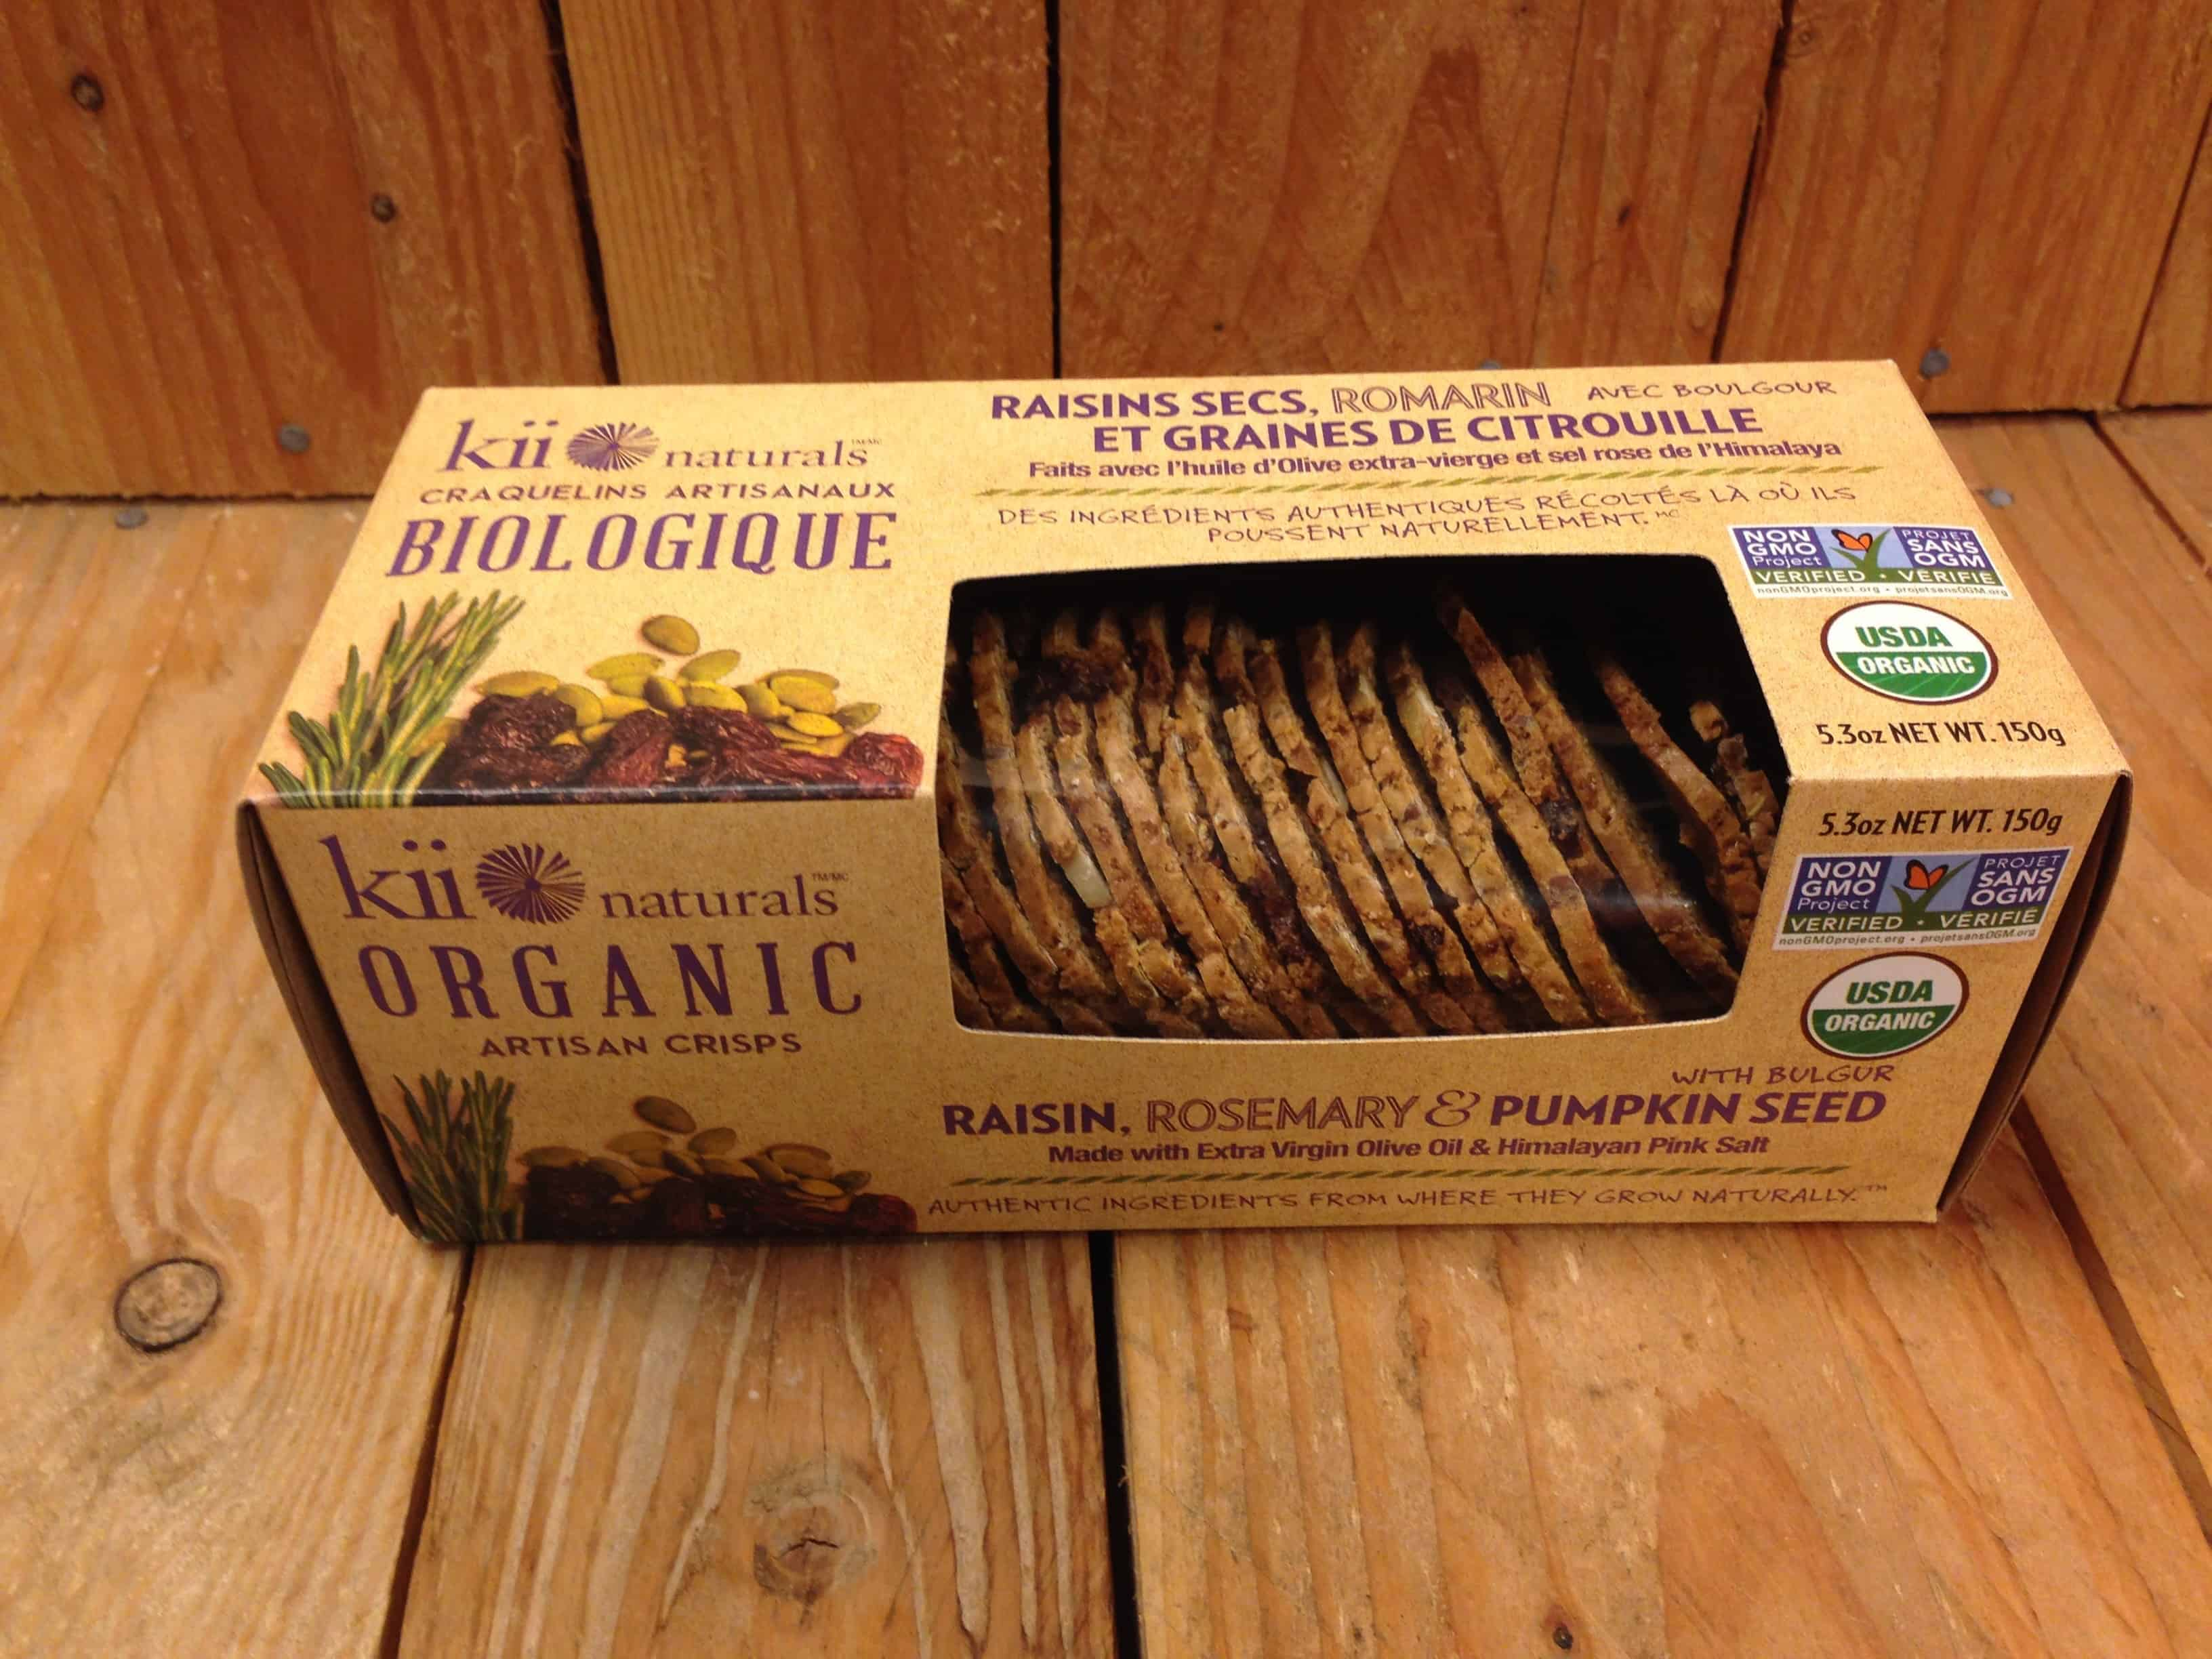 Kii Naturals – Raisin, Rosemary & Pumpkin Seed Artisan Crisps (150g)